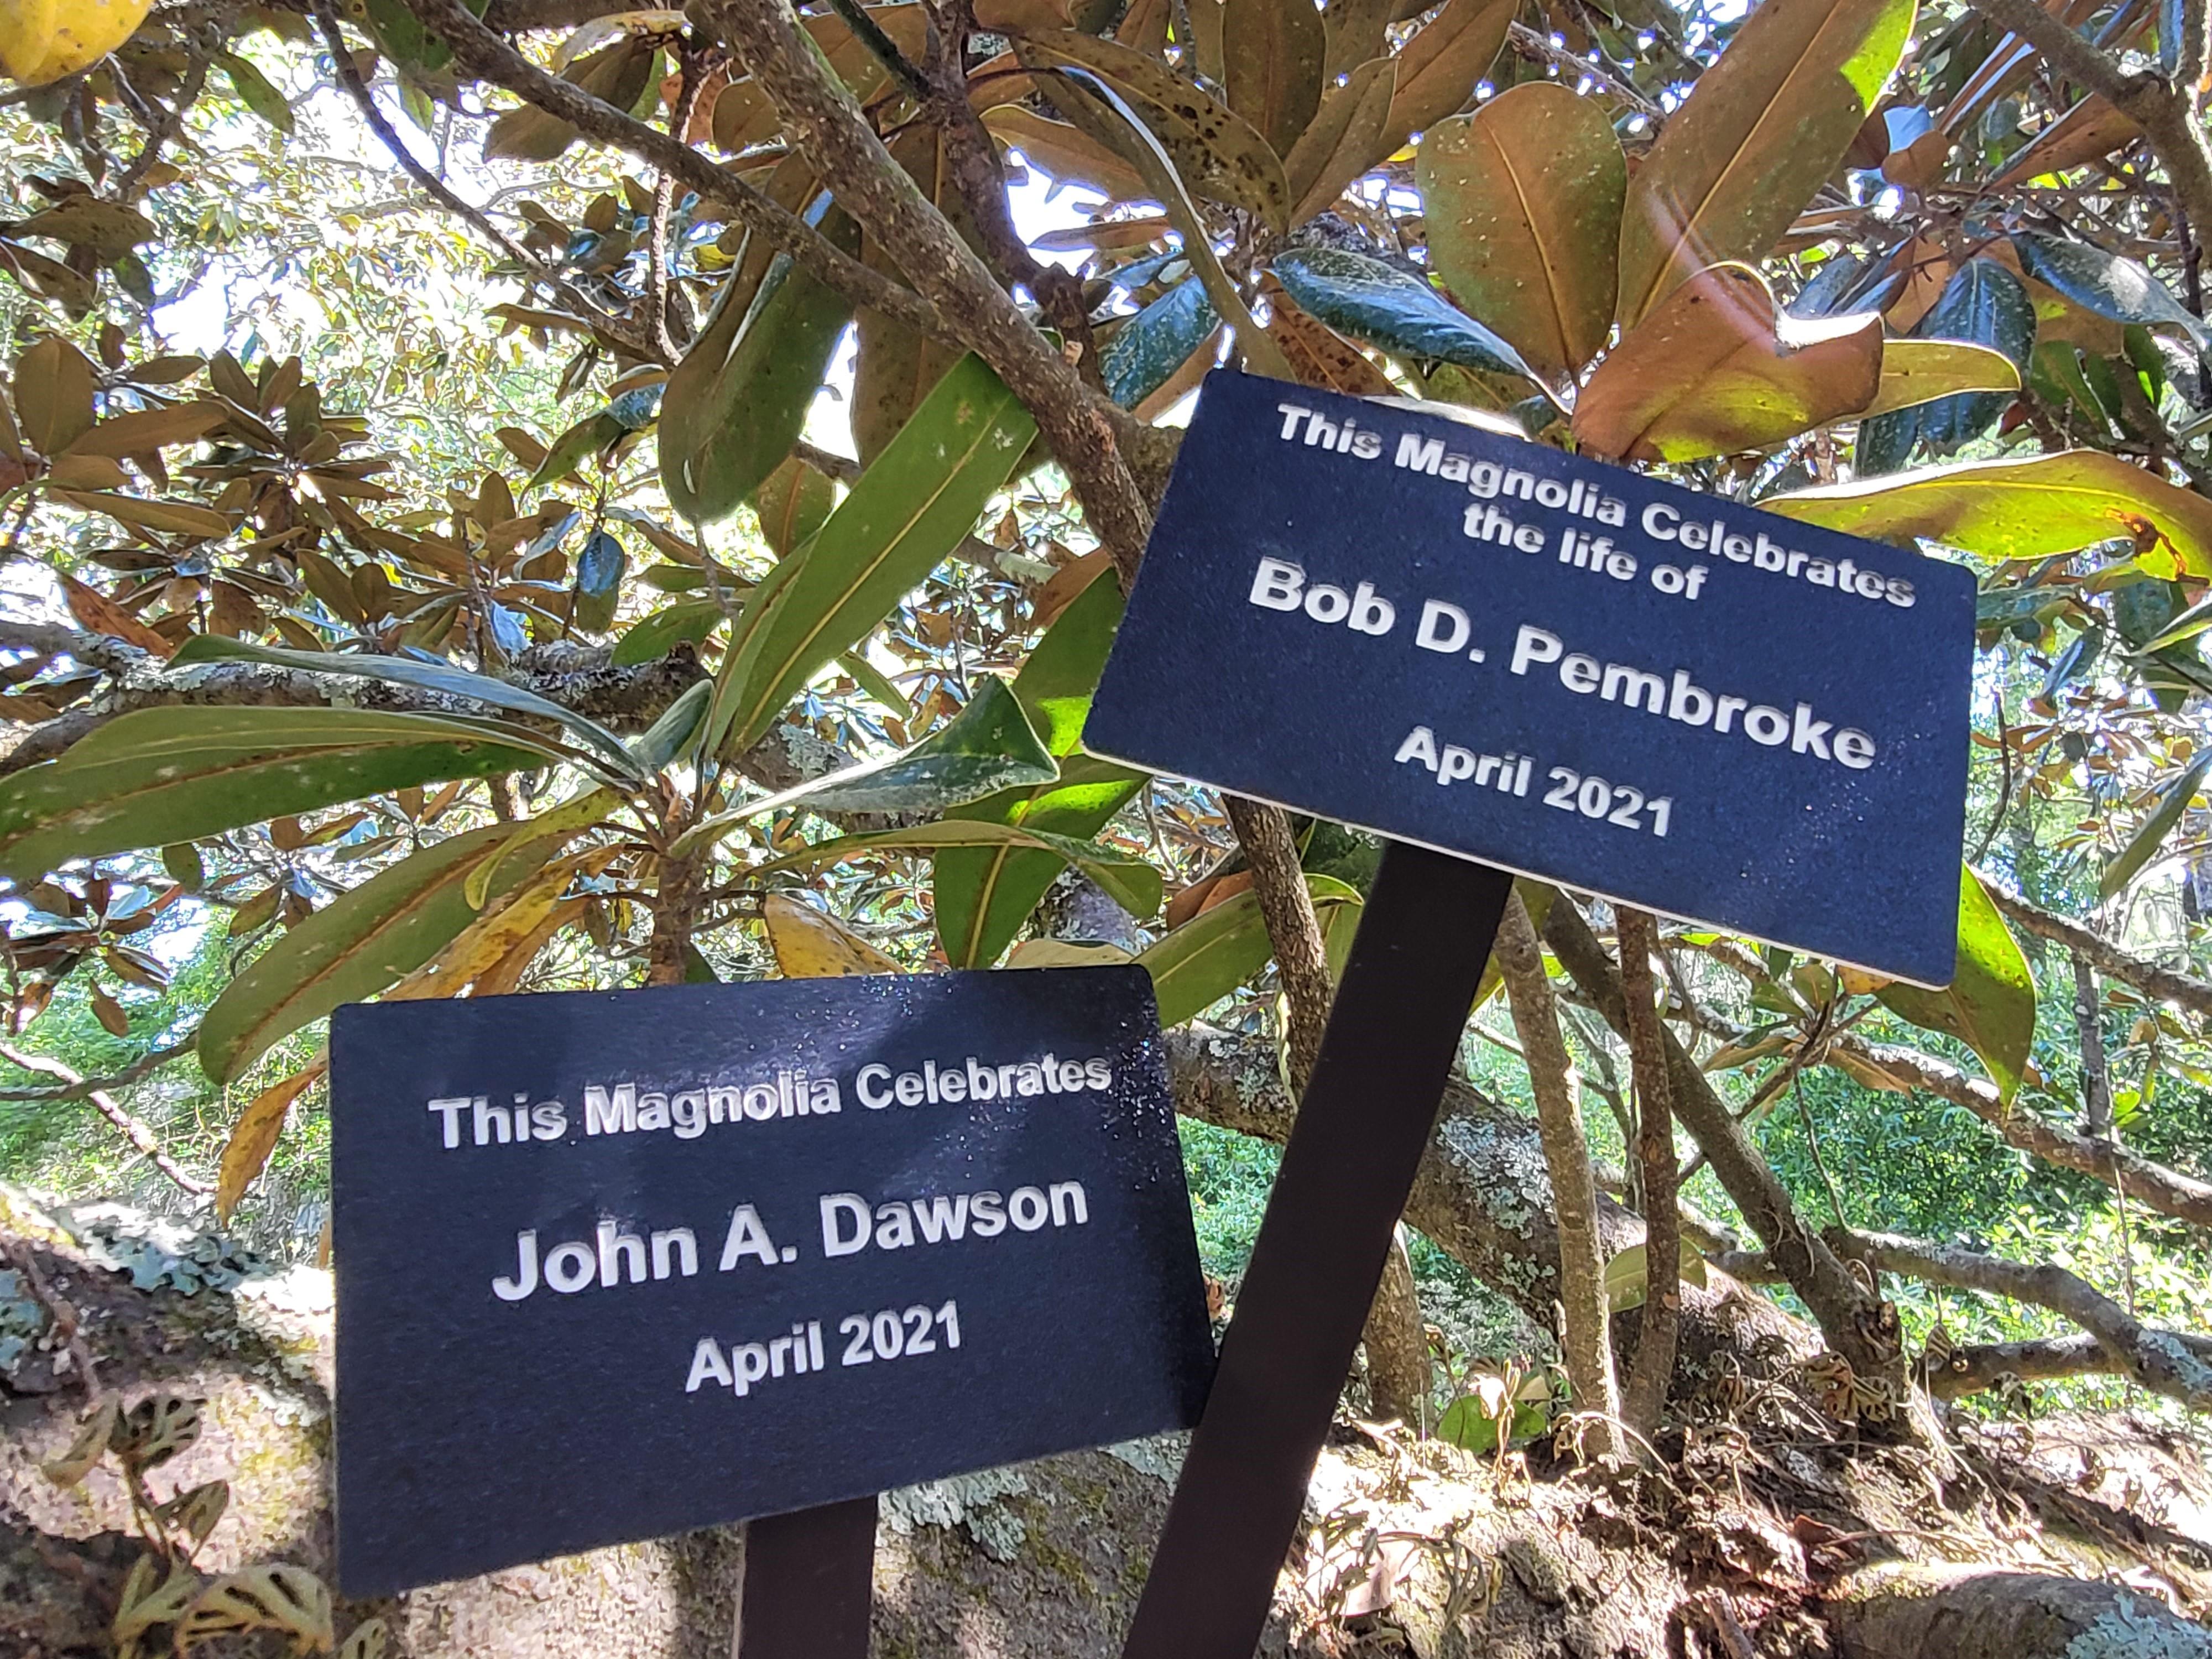 Celebrations along Magnolia Allee